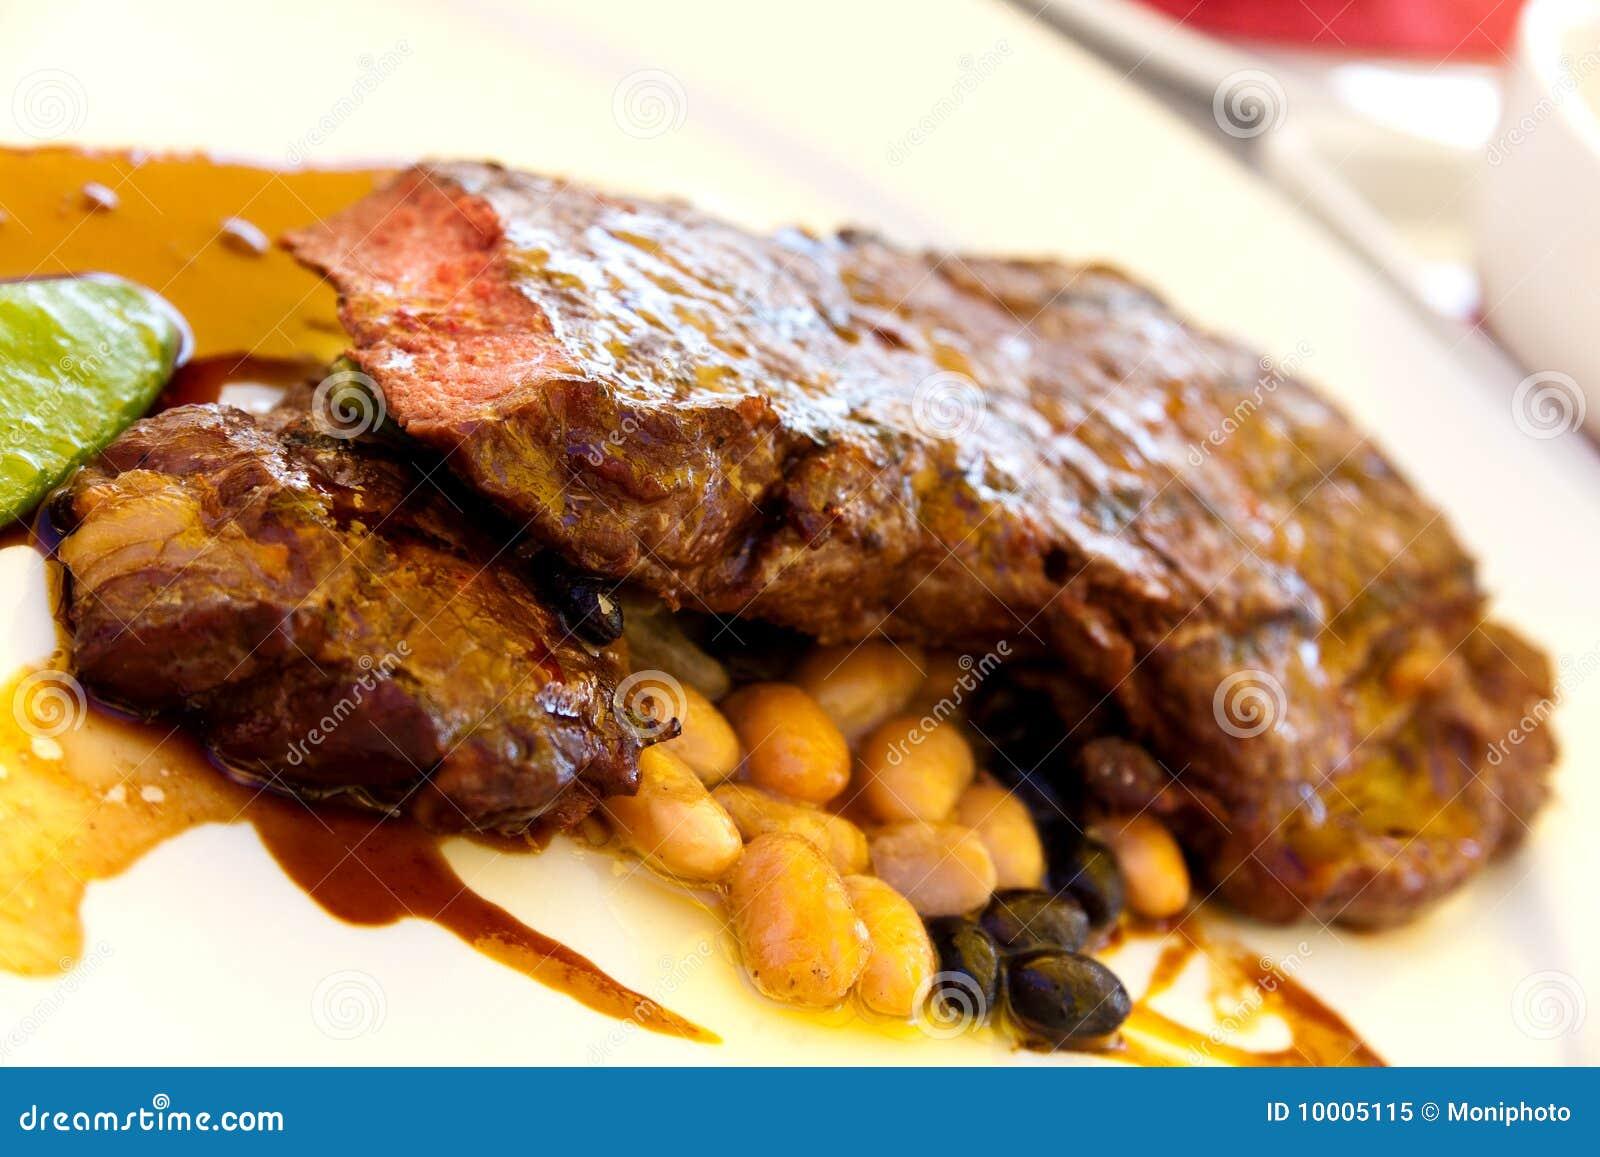 how to prepare sirloin strip steak